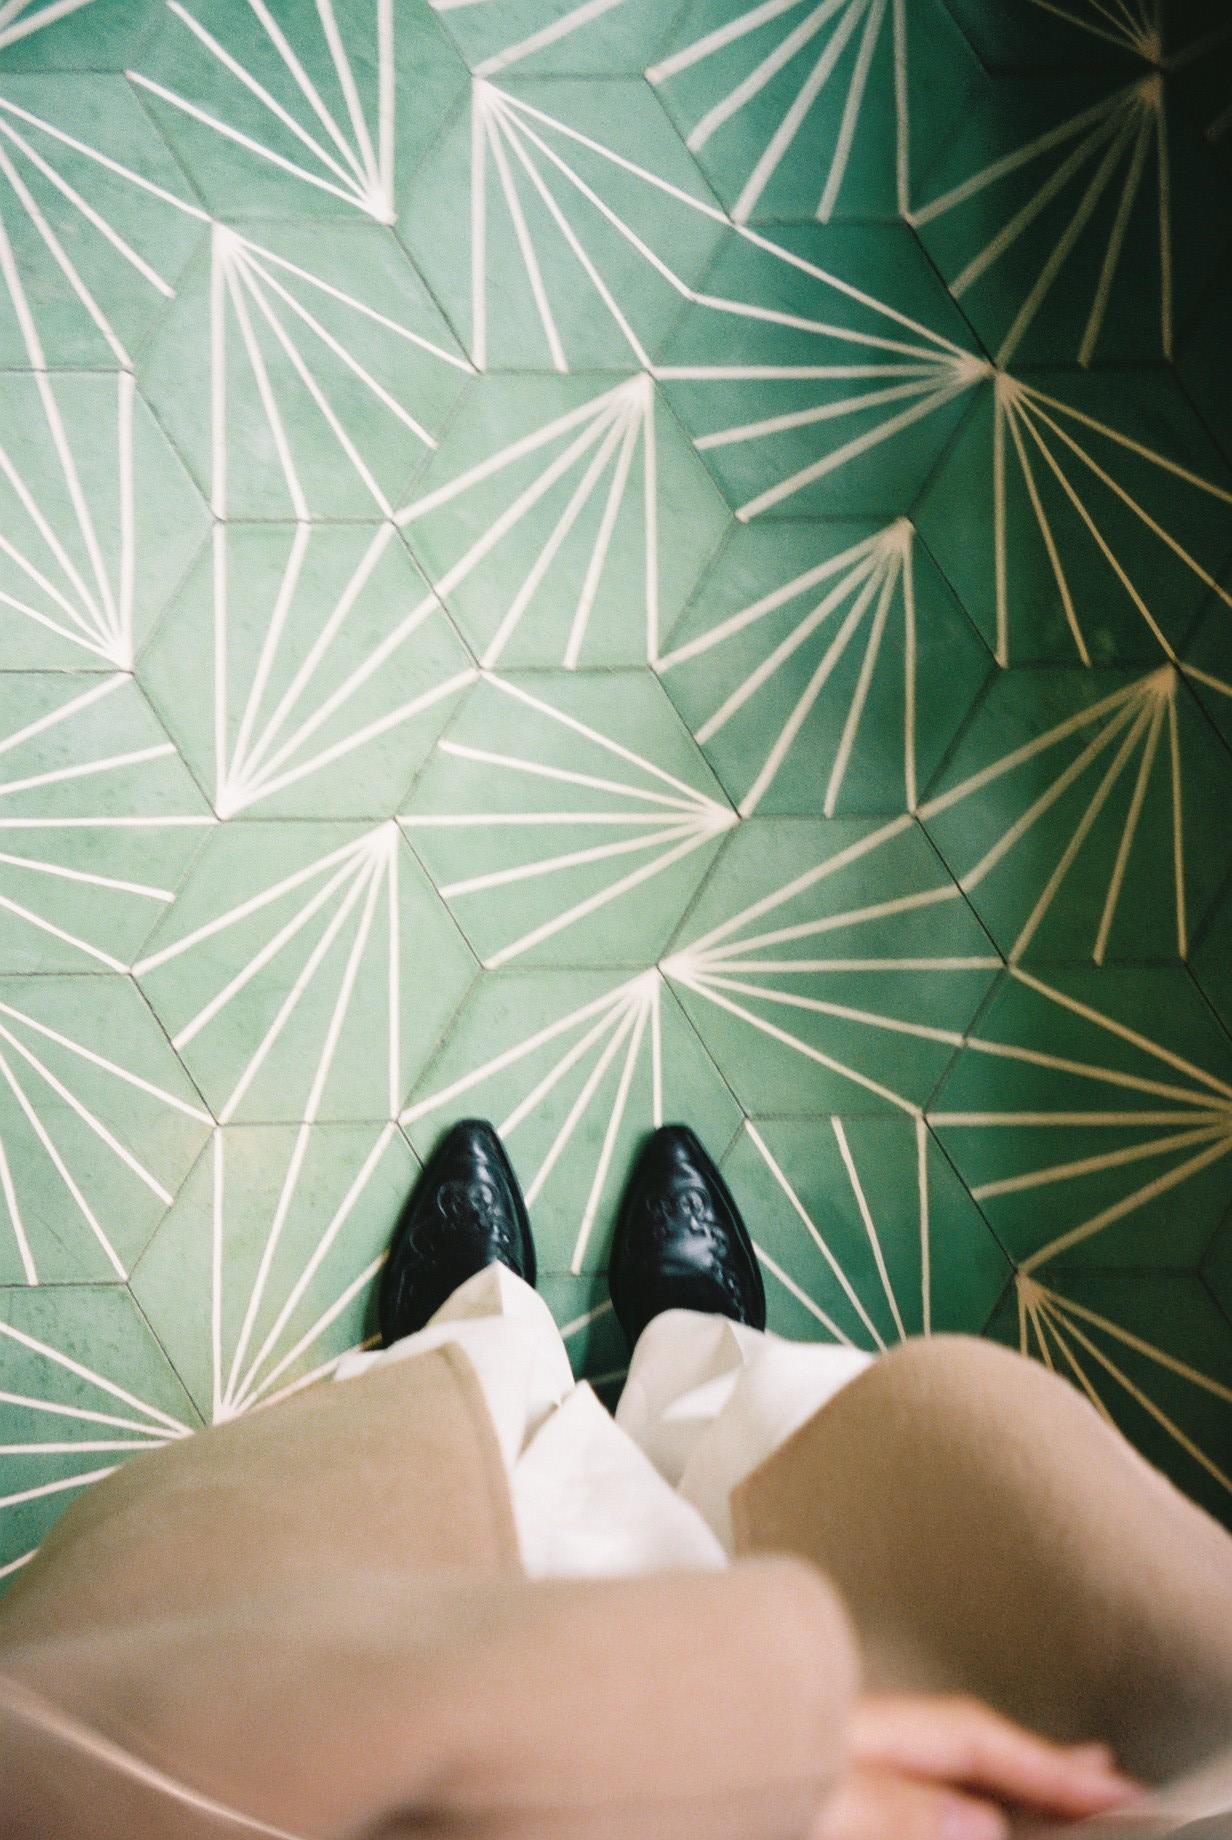 Aesop's floor in Convent Garden.  / O chão da loja da Aesop em Convent Garden.